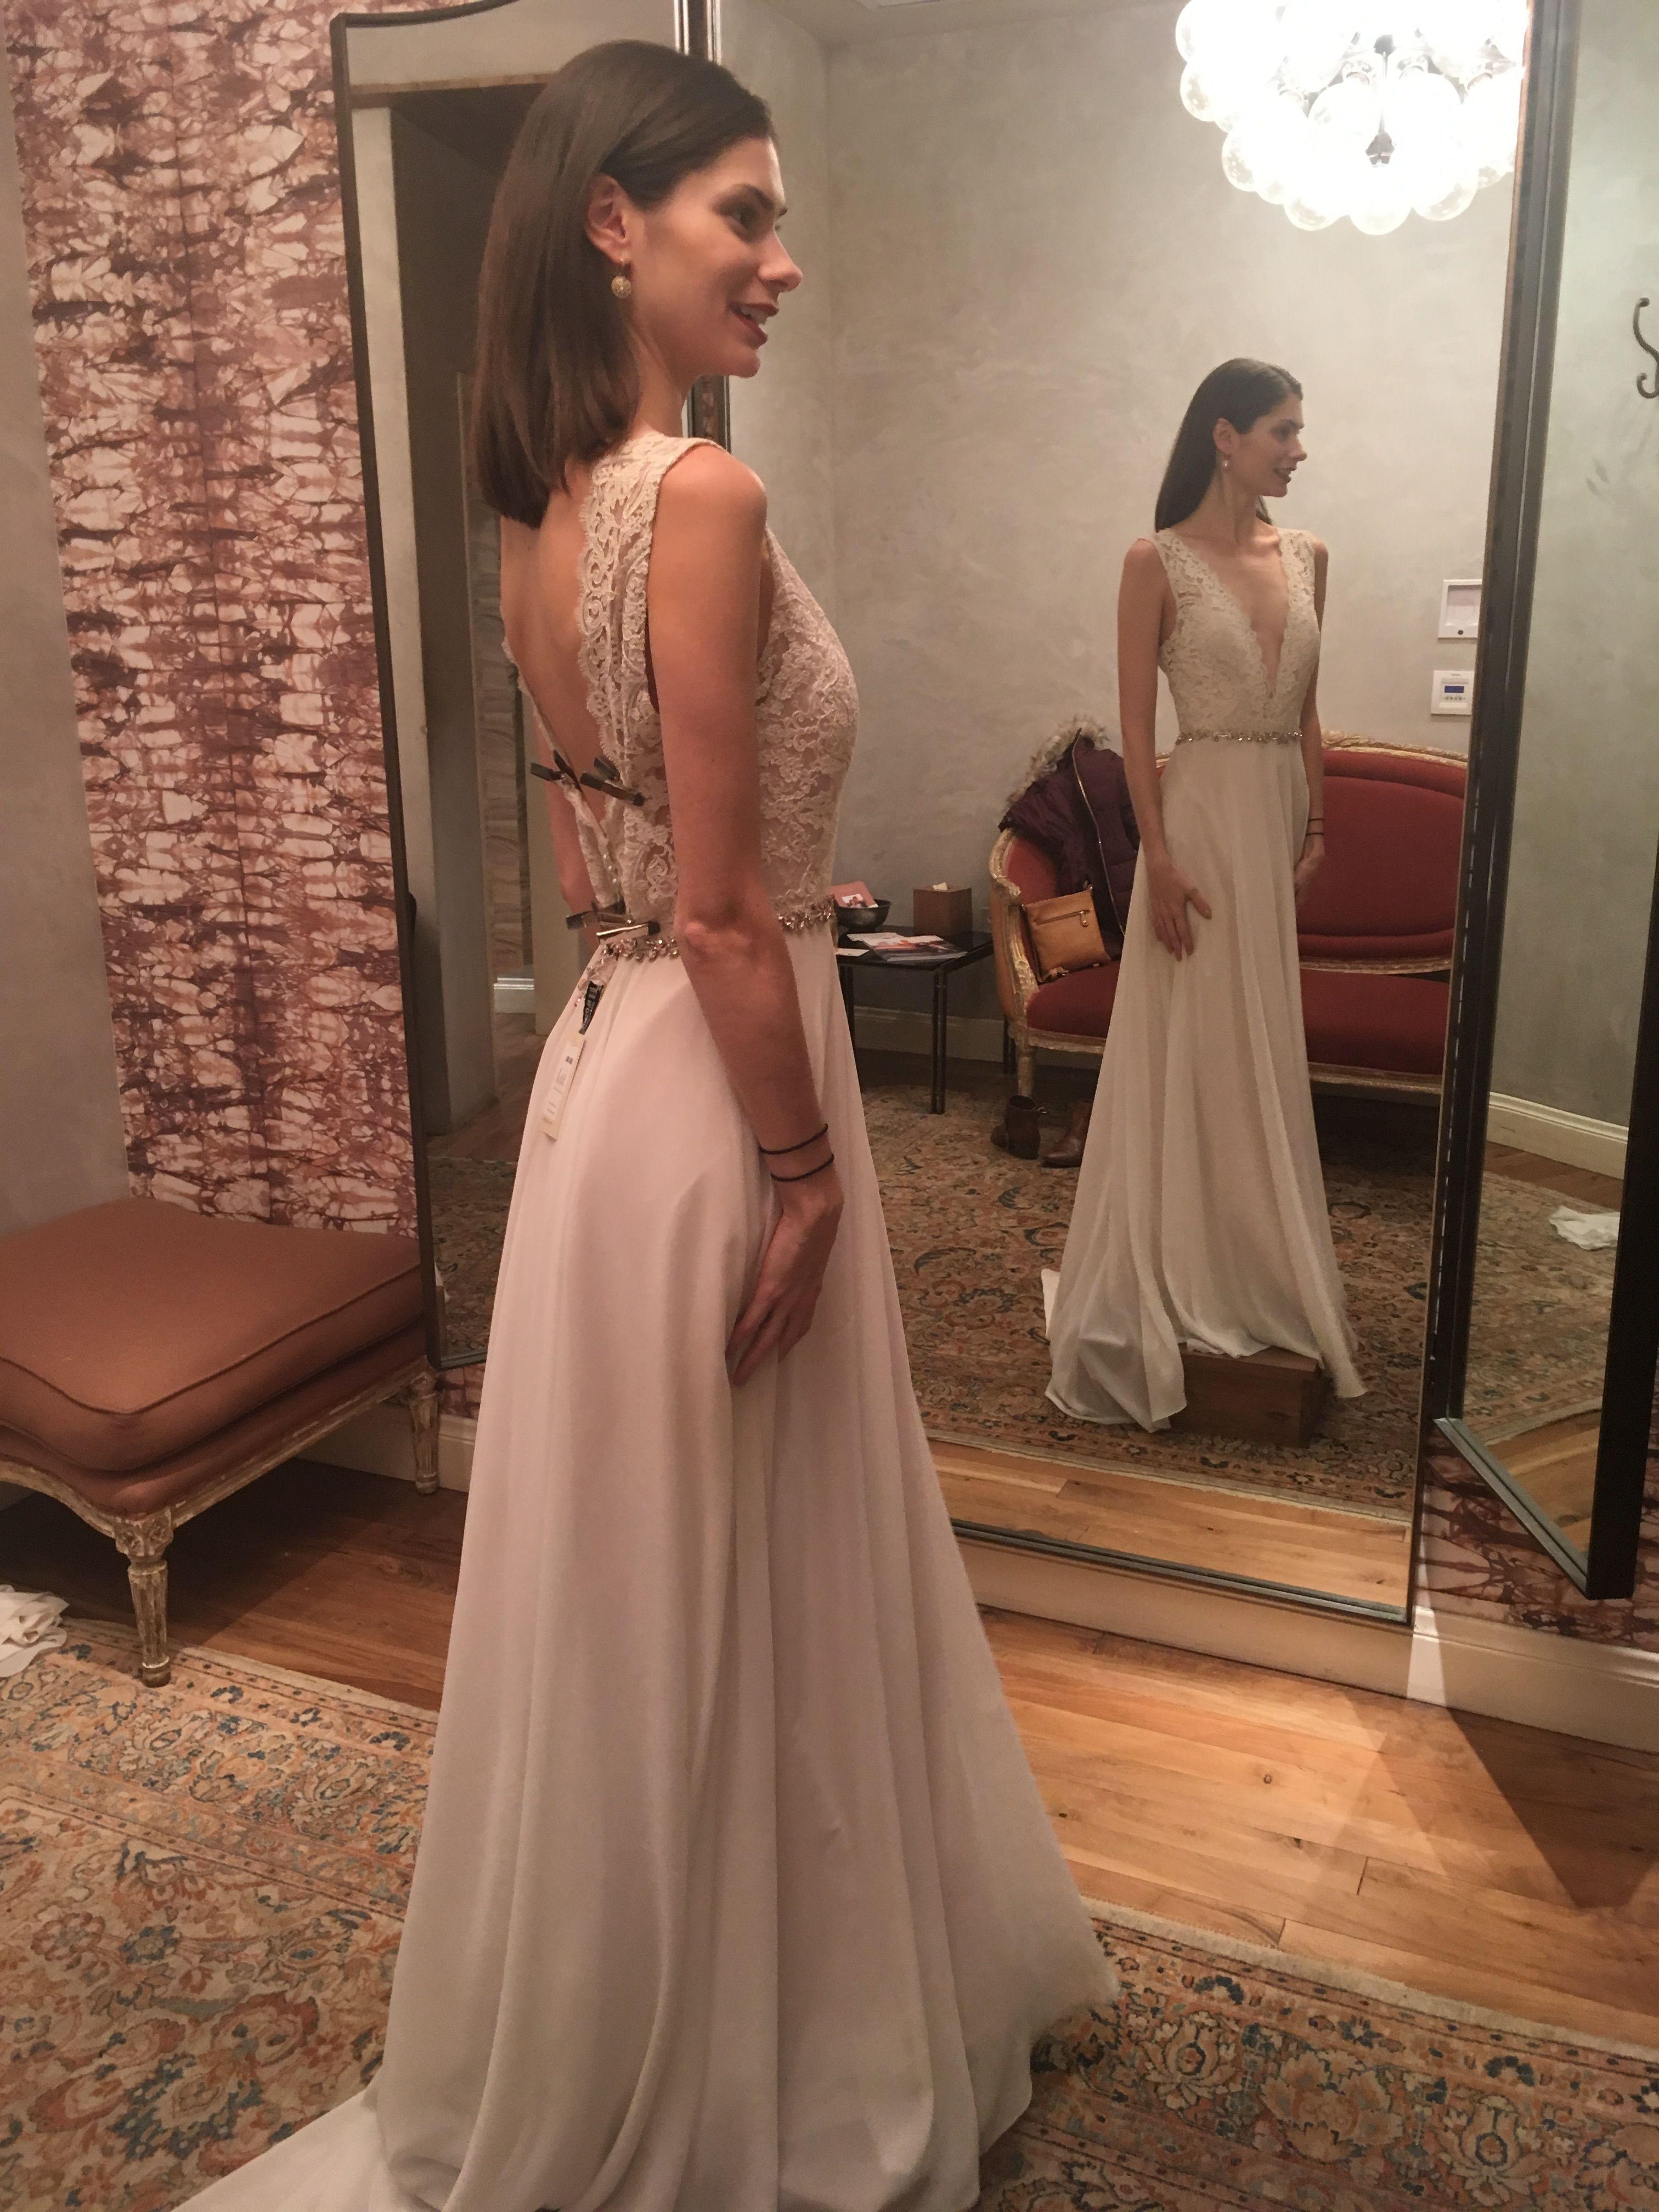 Pin by Erin Clark on Wedding Dress Shopping in Chicago | Pinterest ...